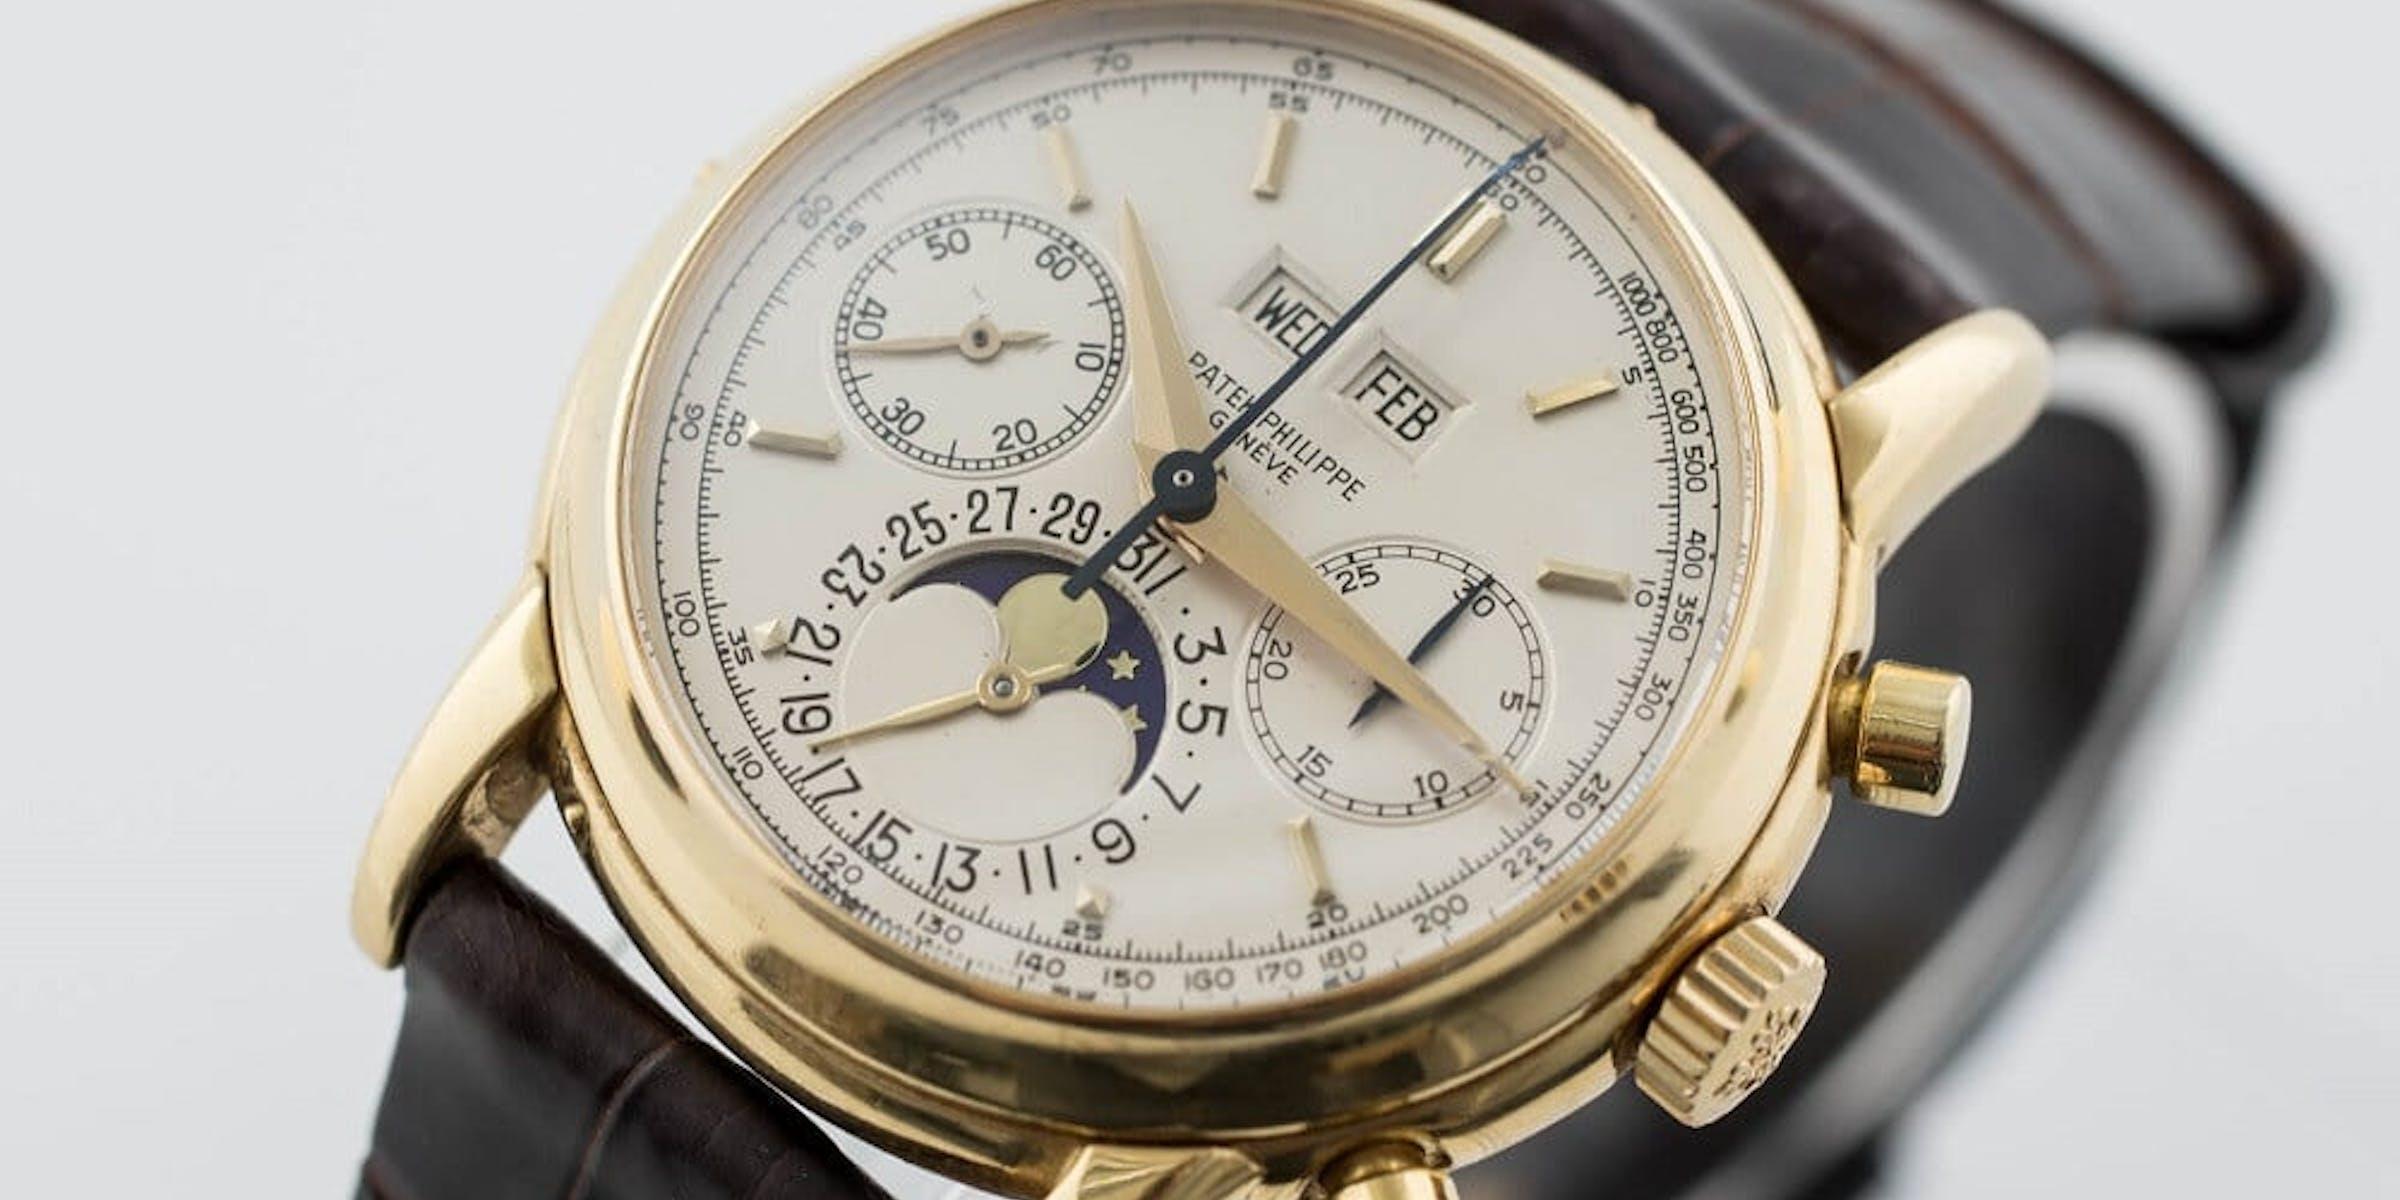 Patek Philippe Perpetual Calendar Chronograph Ref 2499